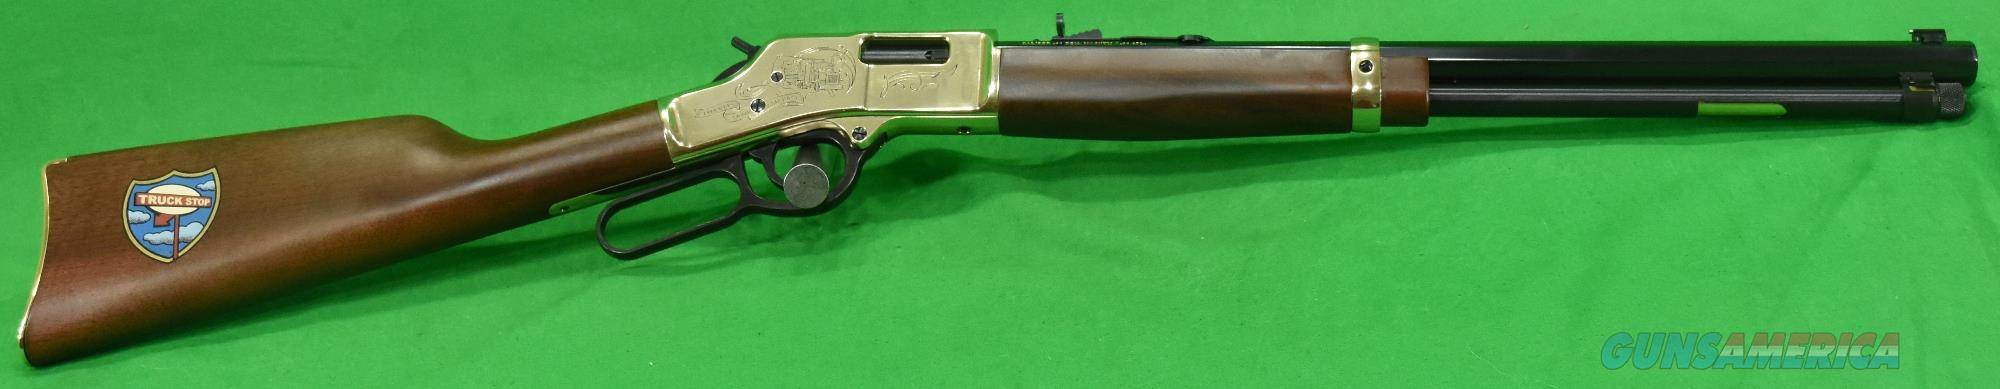 Big Boy Truckers Tribute 44Mag 20In  H006TT  Guns > Rifles > Henry Rifles - Replica